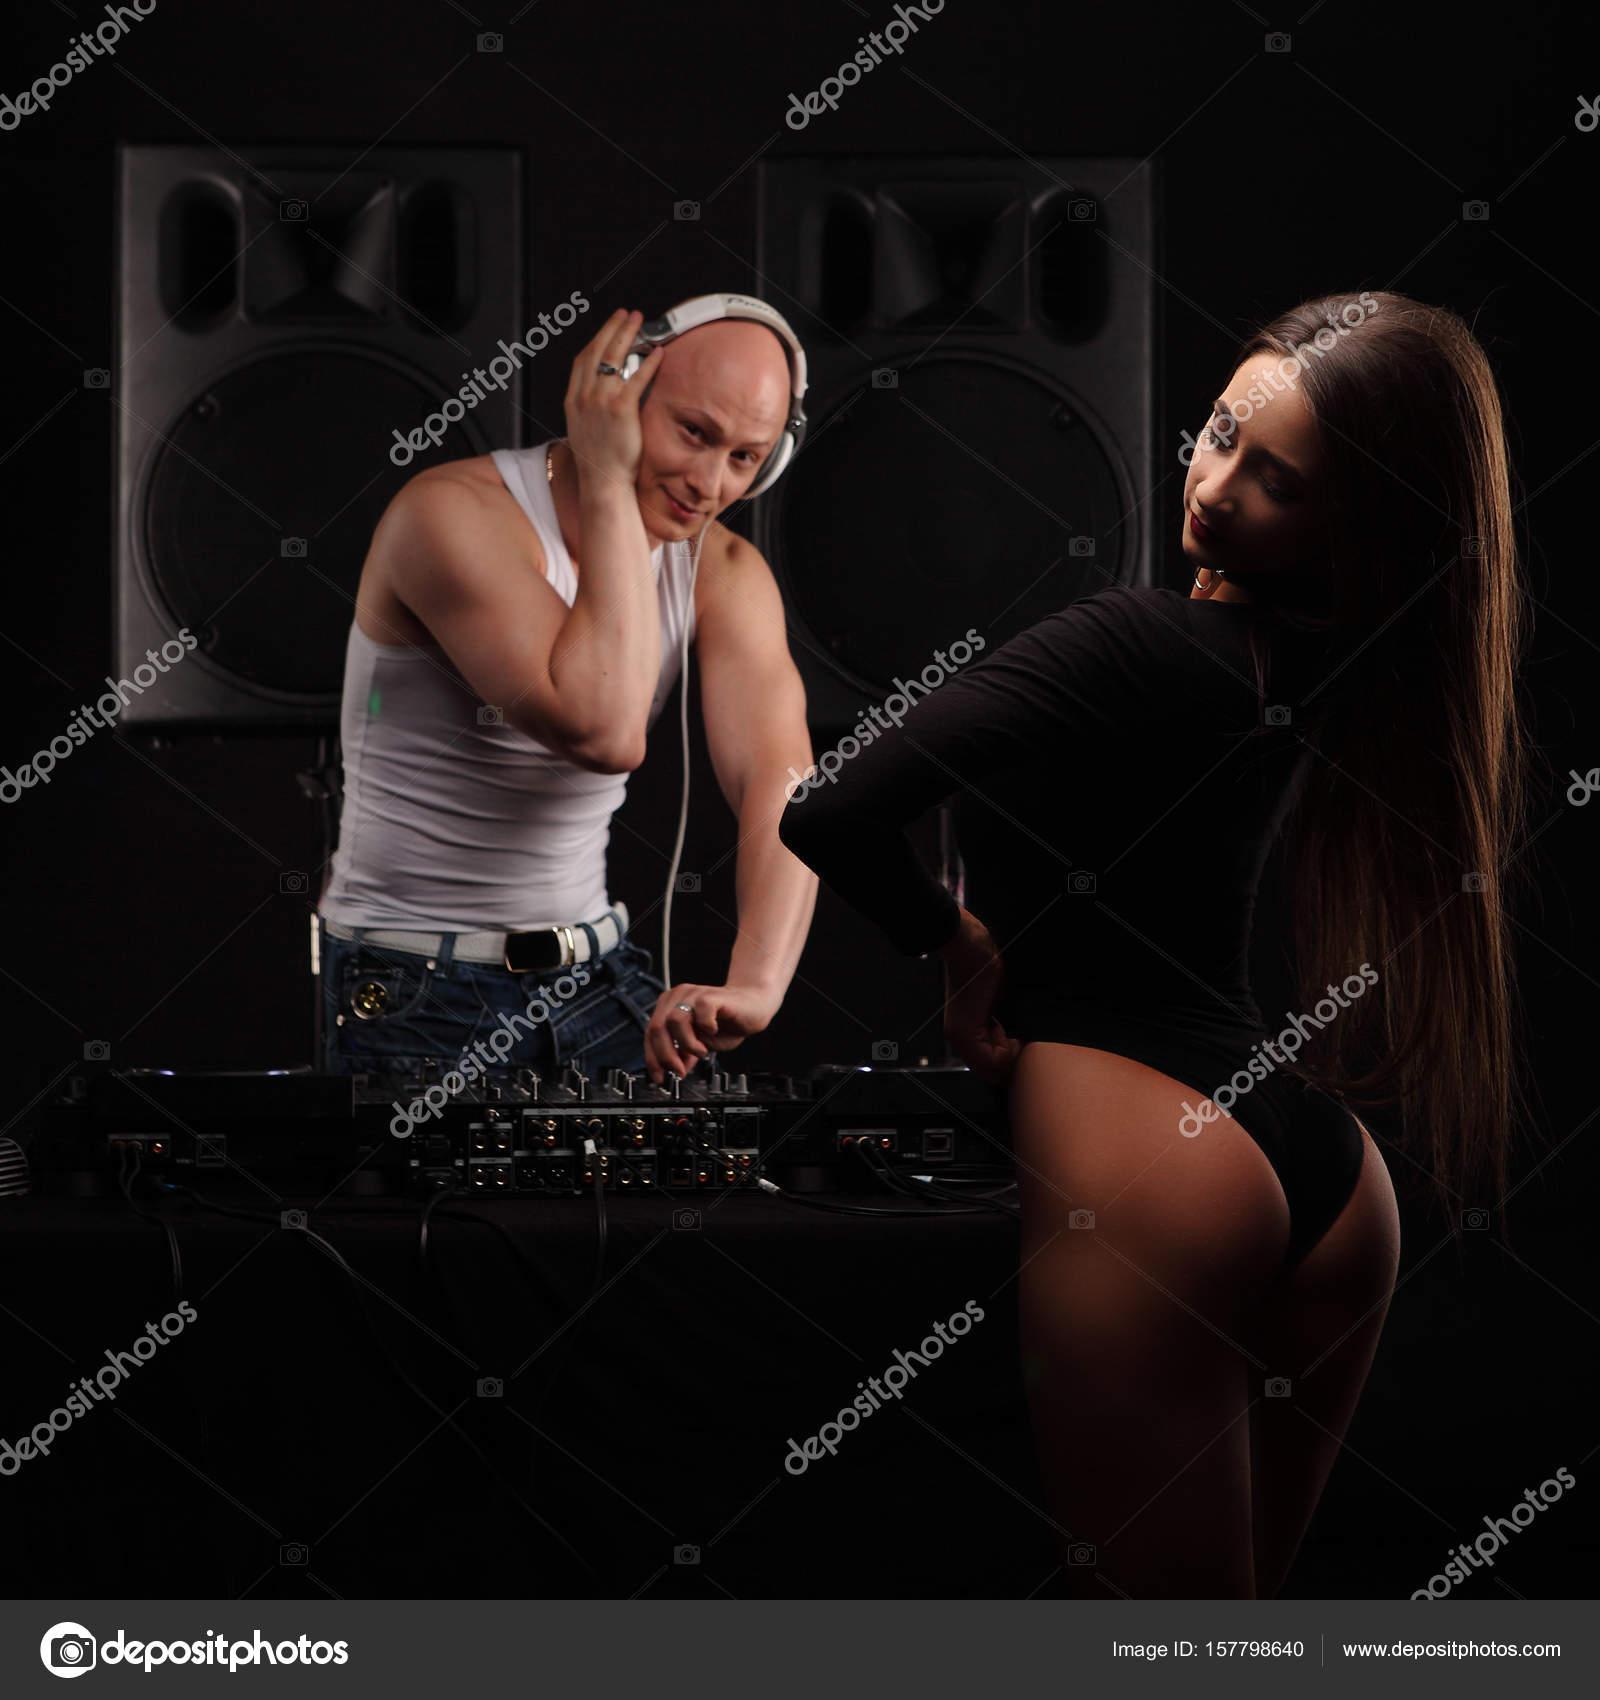 Kinky couple's POV creampie sex